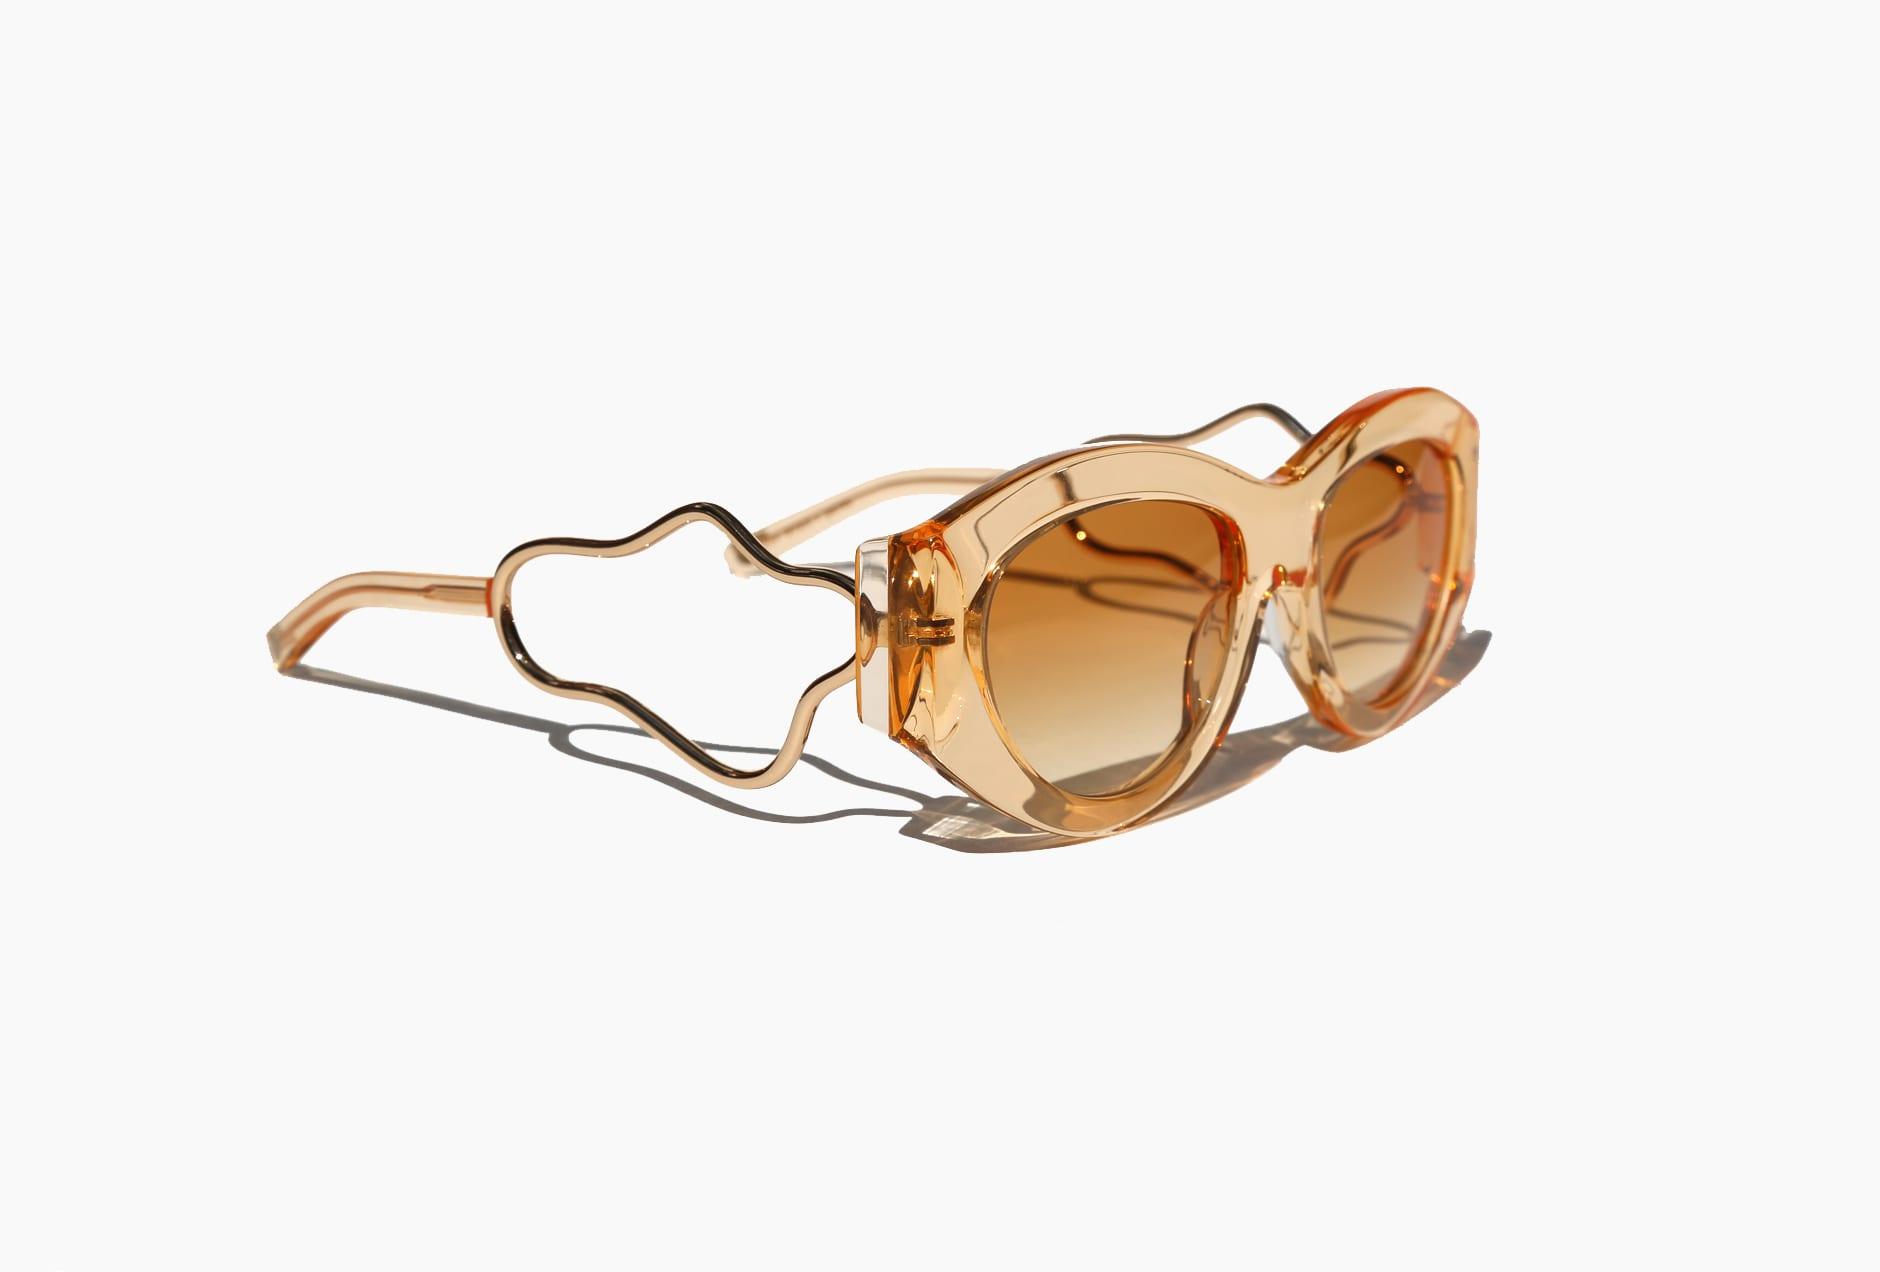 holly ryan pared eyewear shades